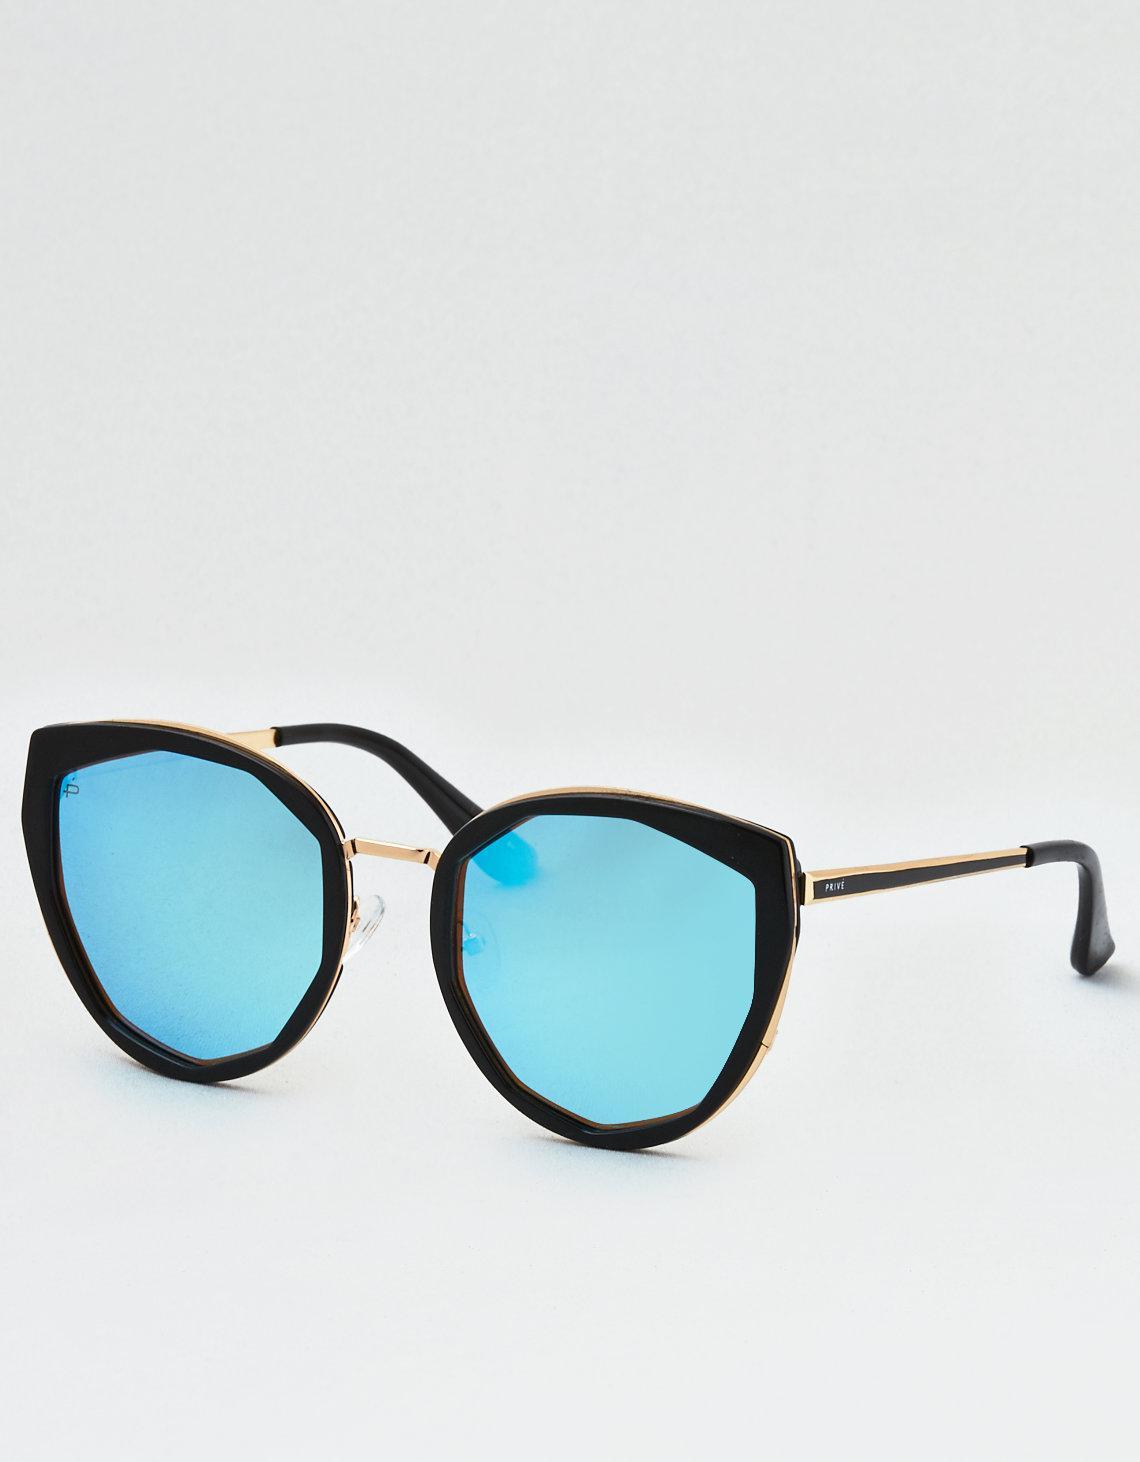 7d99c1dd88 Lyst - American Eagle Privé Revaux The Artist Sunglasses in Blue